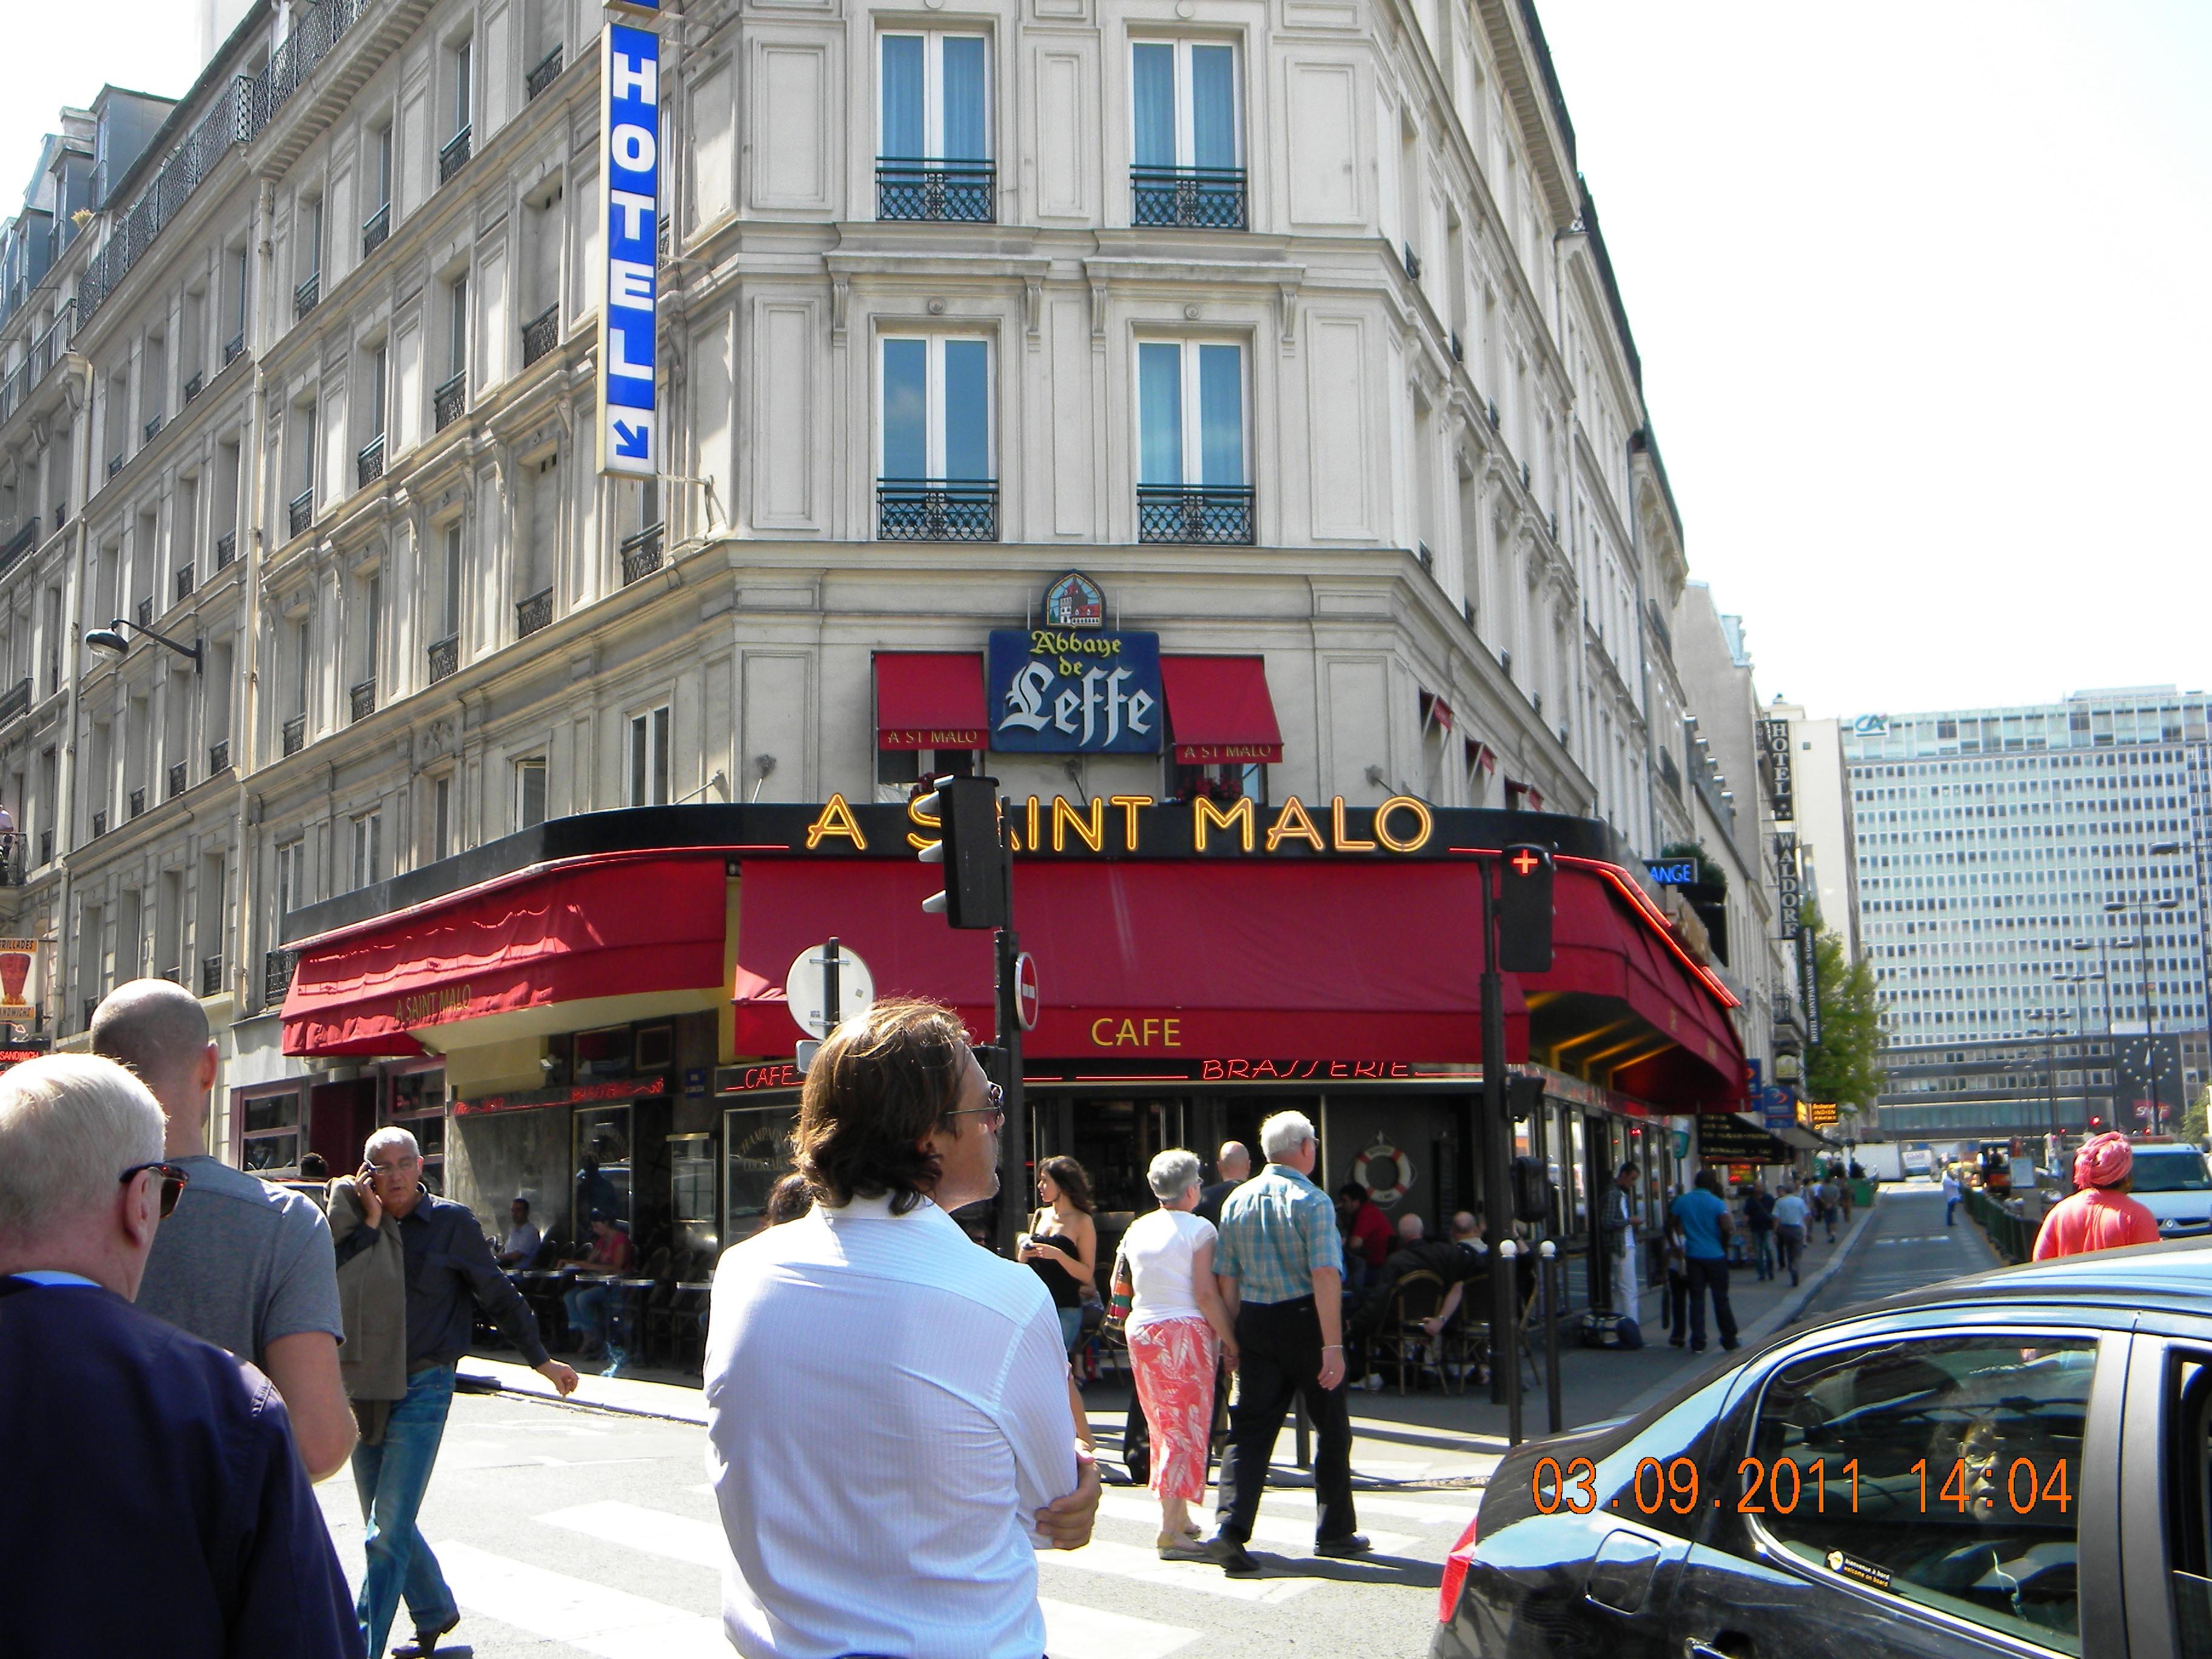 File:Montparnasse - Bienvenue, Bistrou Saint-Malo, Paris.jpg ...